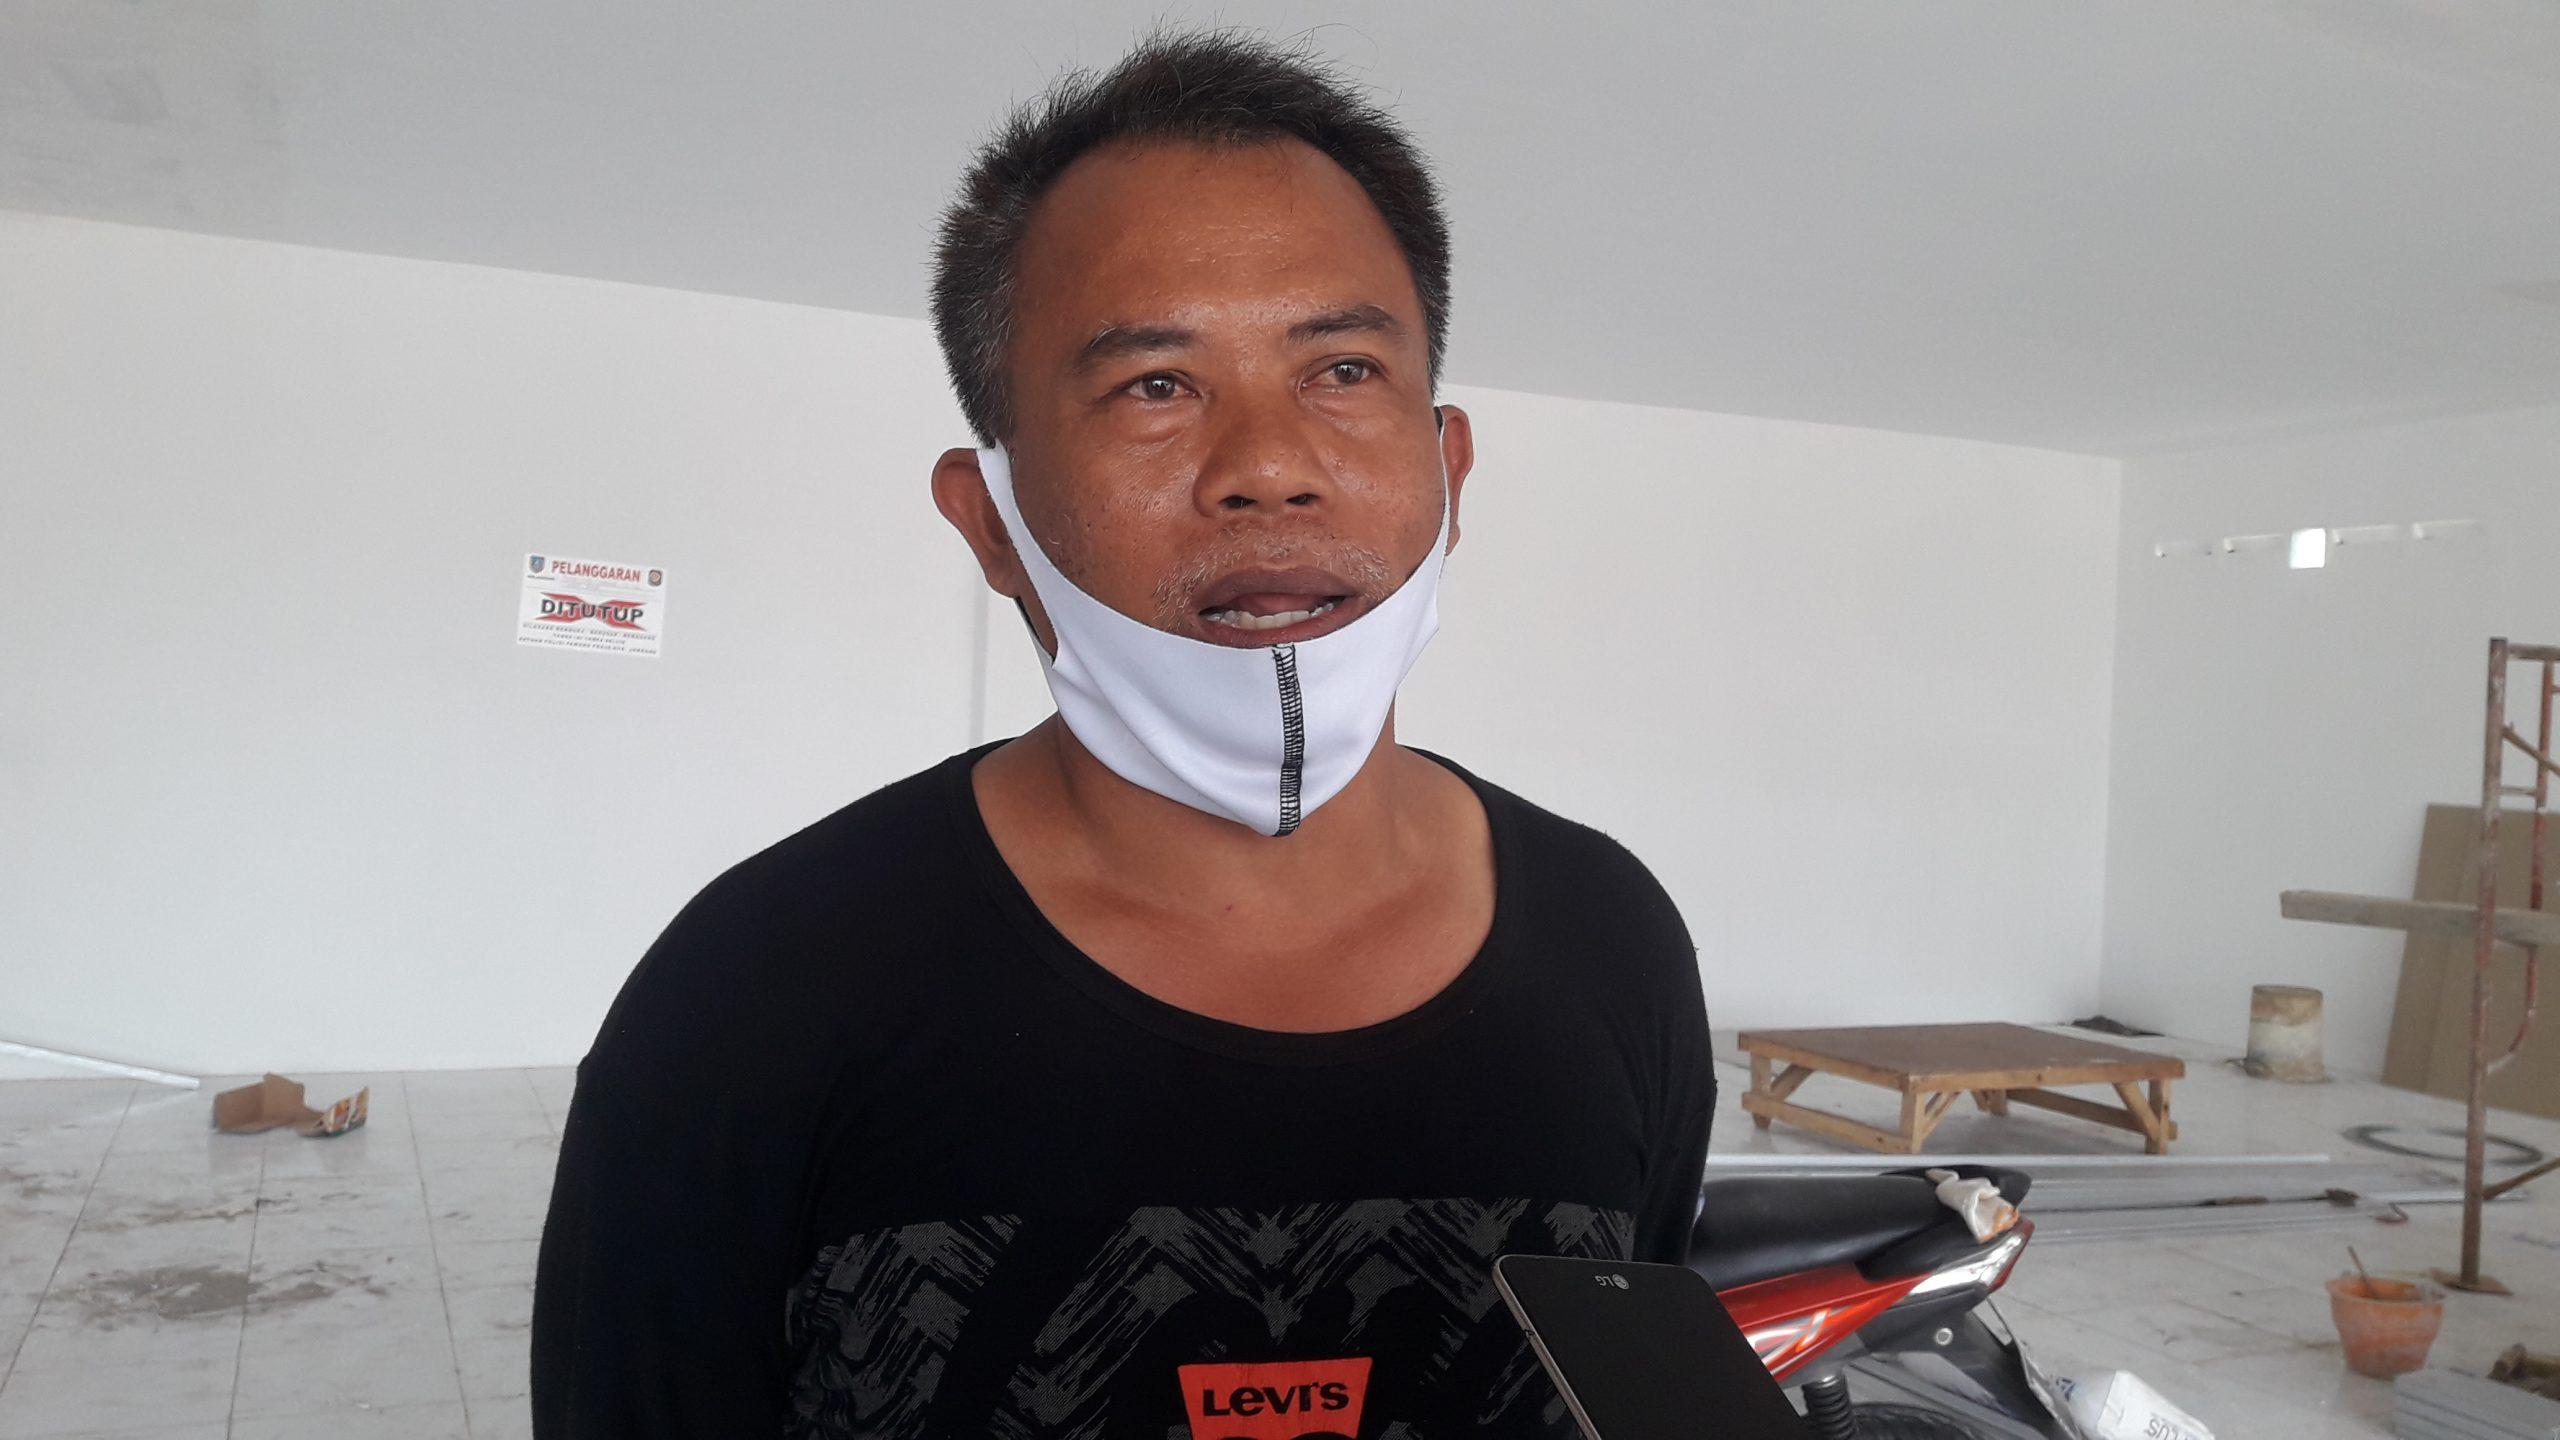 Bangunan Disegel, Pendirian Minimarket di Pedesaan Jombang Ditolak Warga